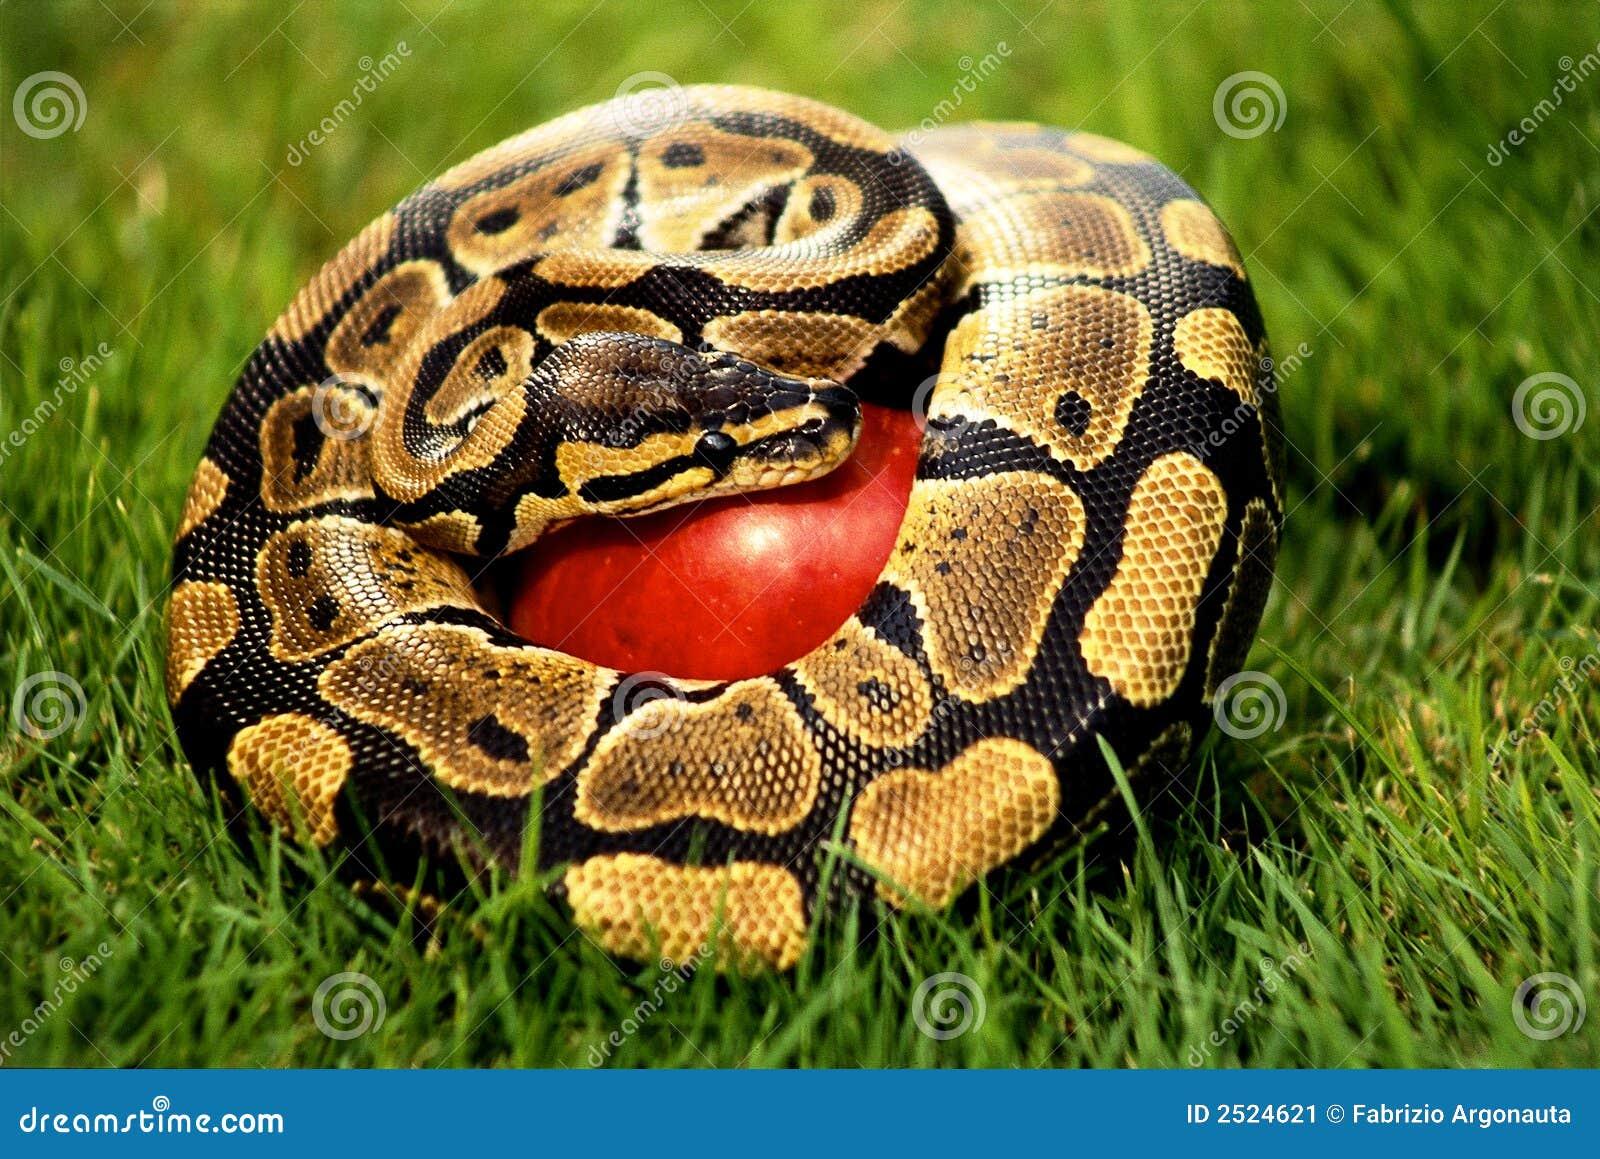 Serpent On Apple Stock Image - Image: 2524621